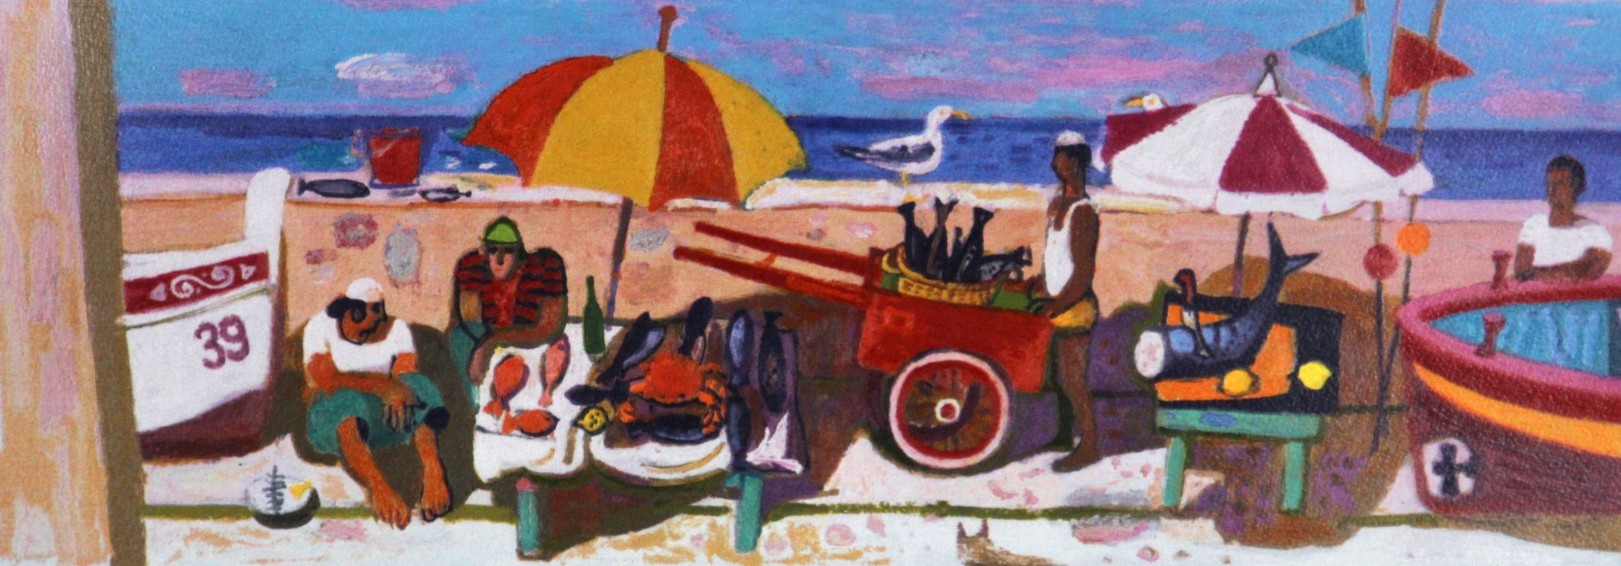 Leon Morrocco_Moroccan Fisherman_Silkscreen_234x657